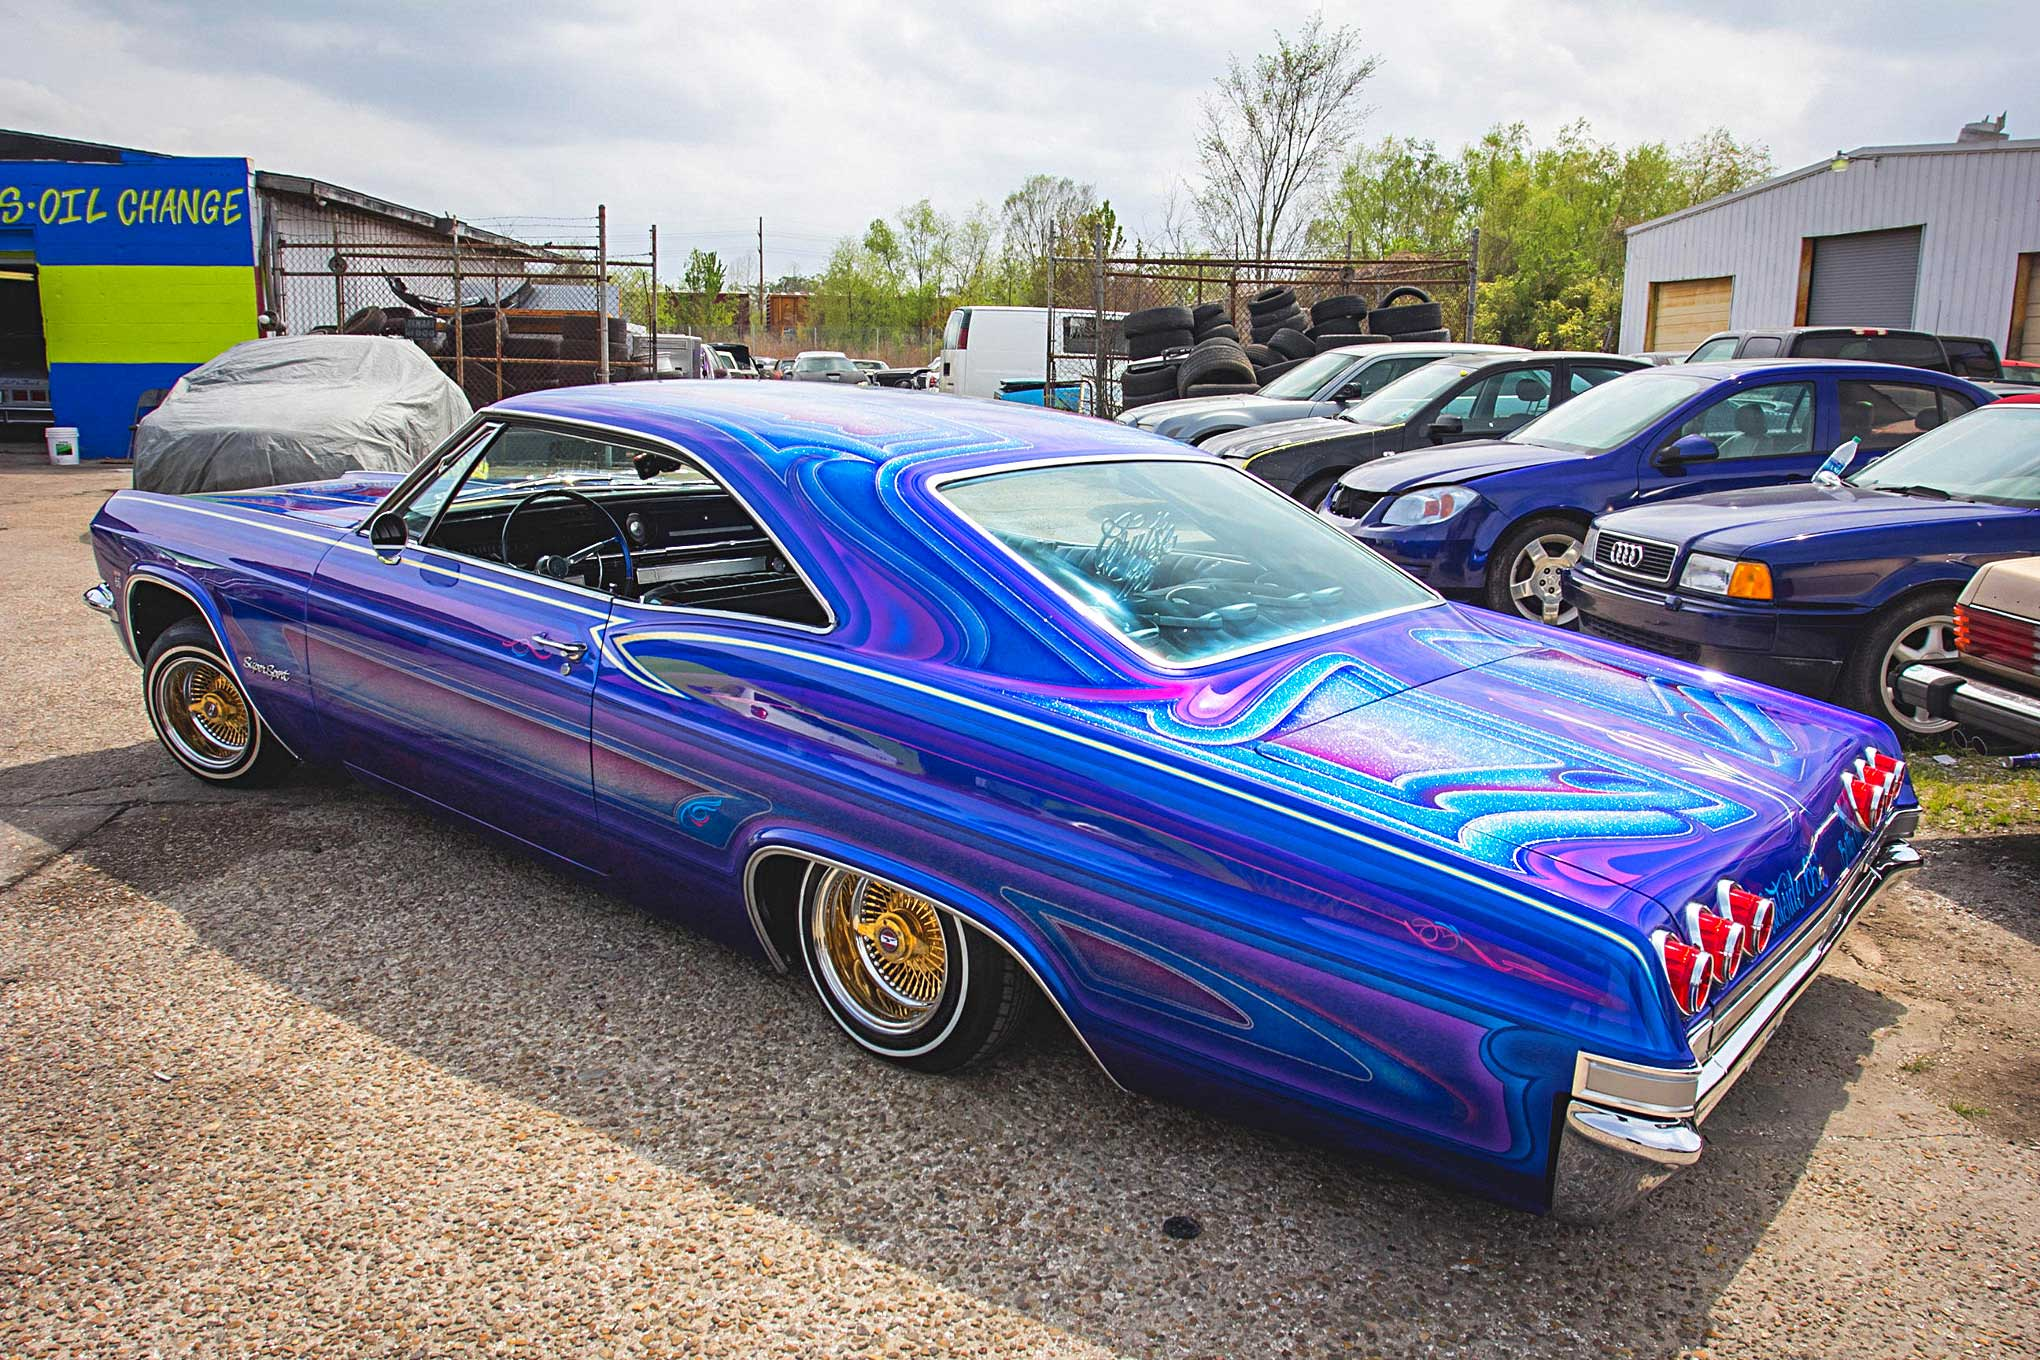 1965 Chevrolet Impala Super Sport - Cruise Life